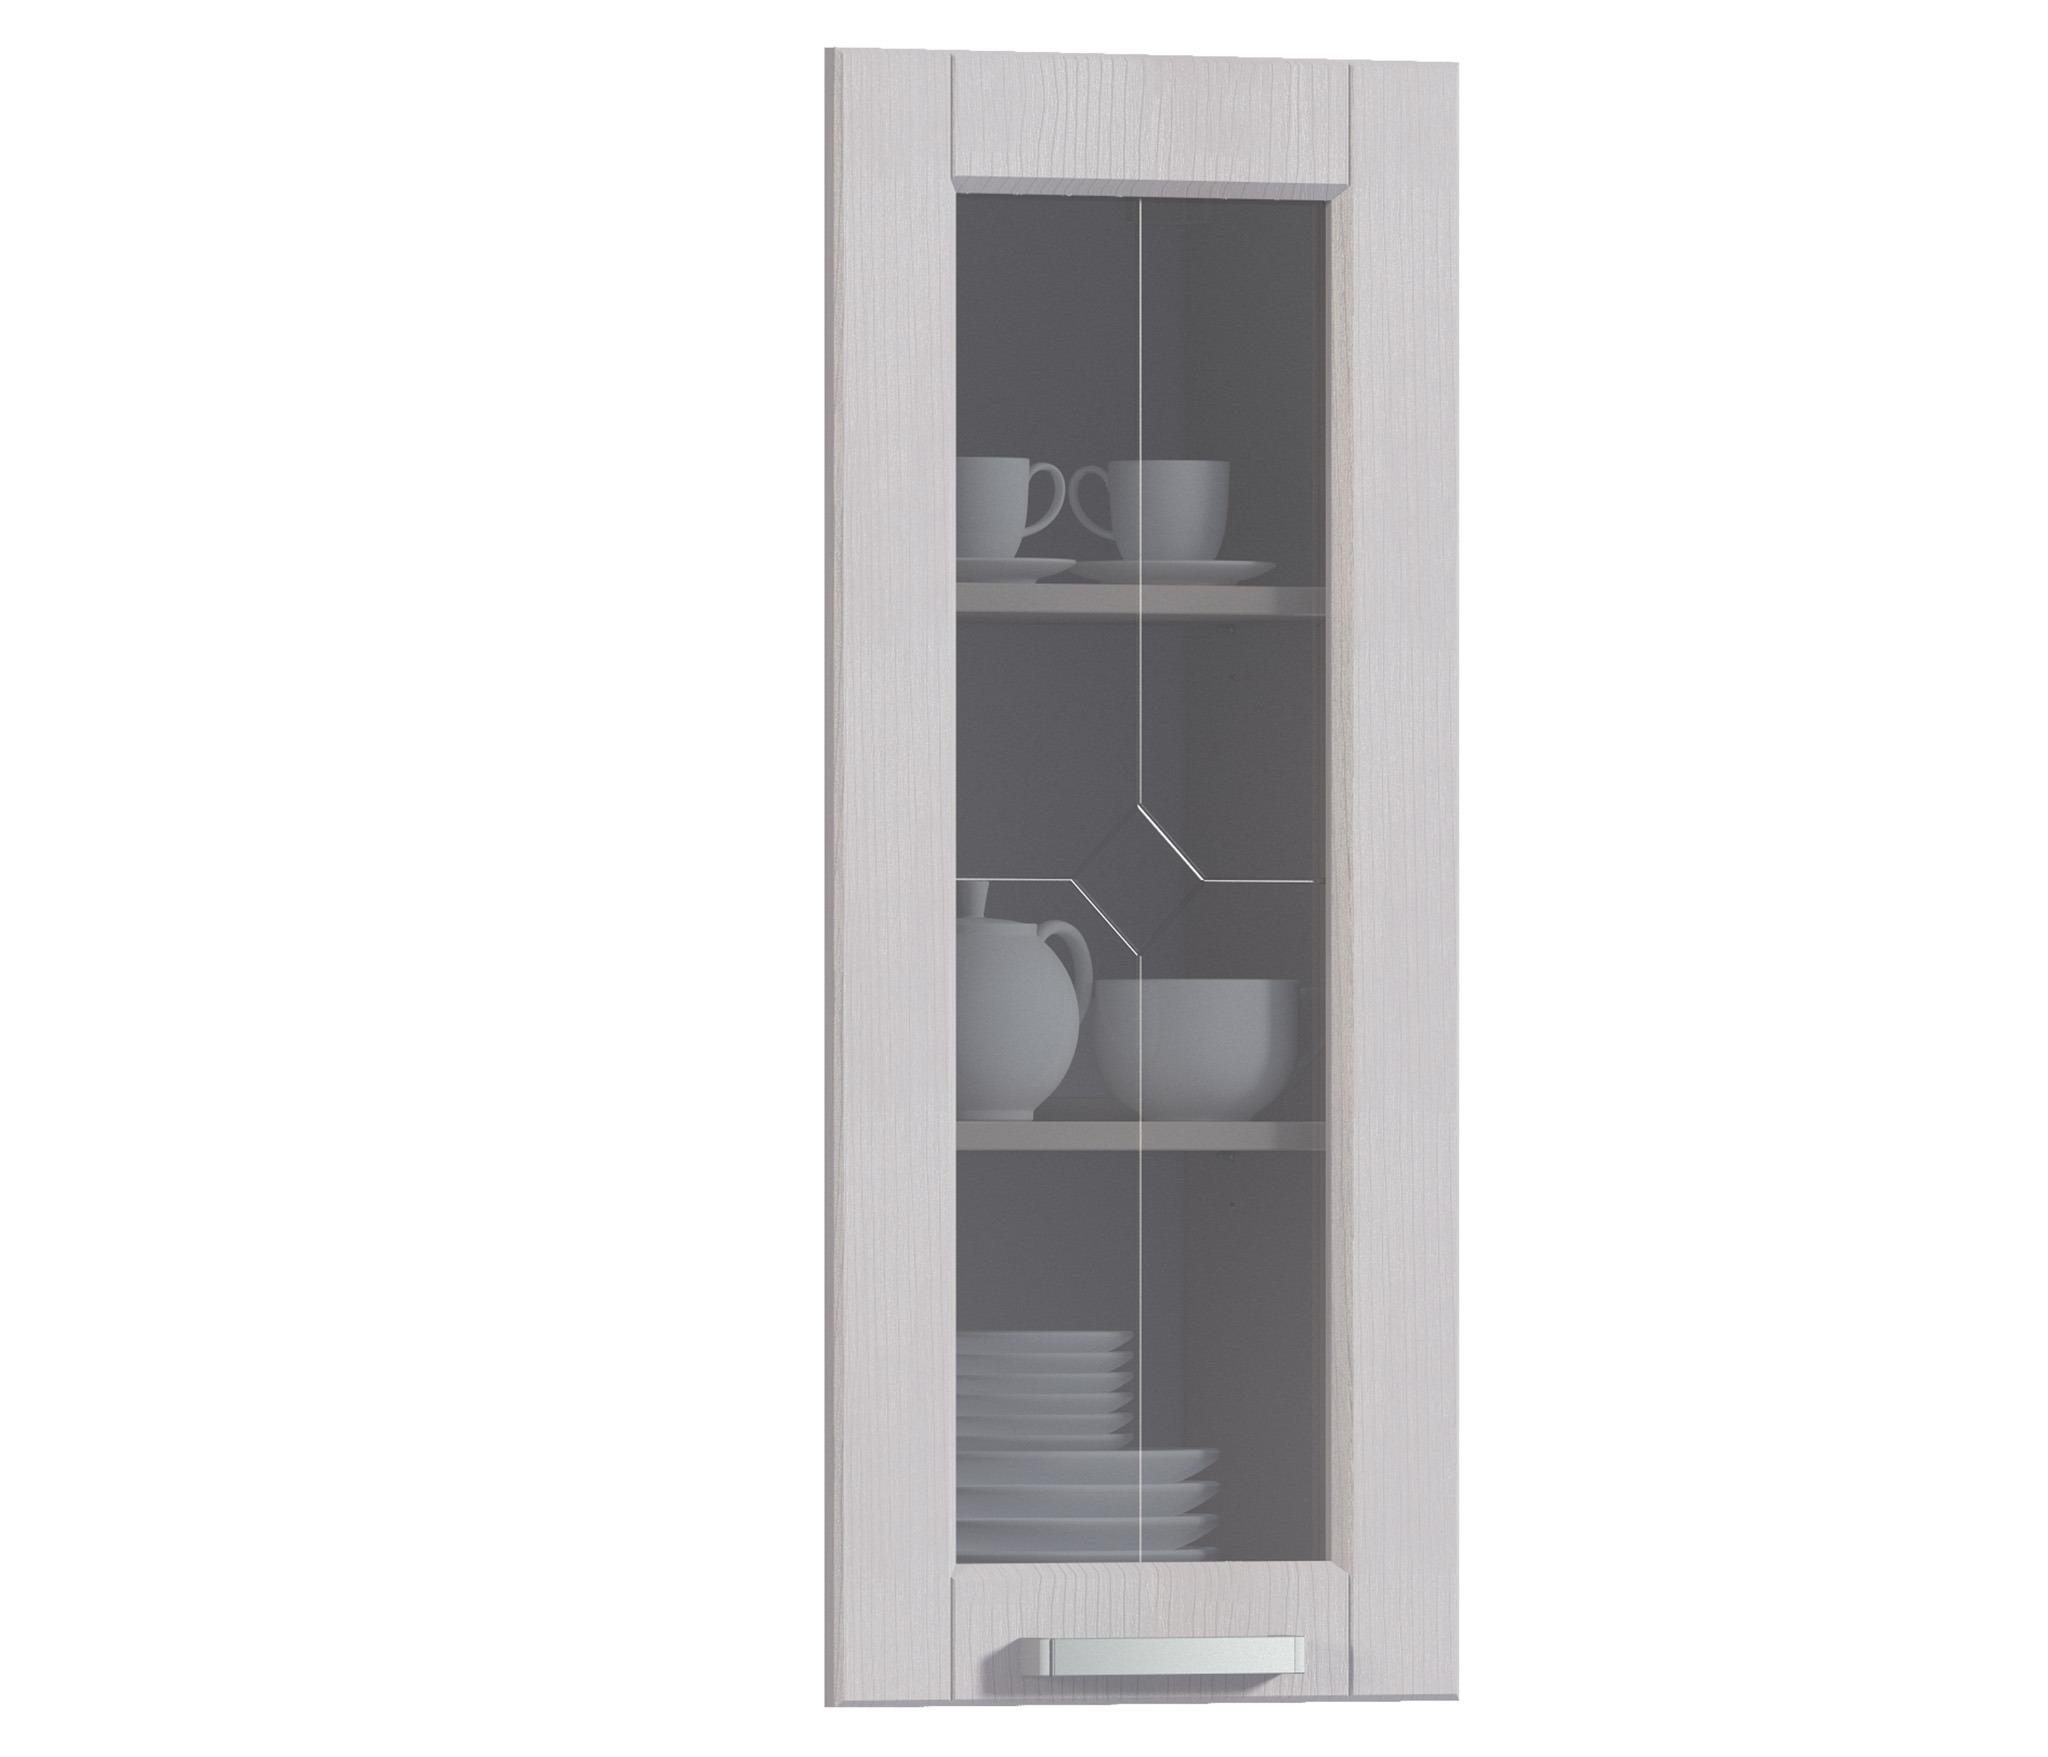 Фасад Регина ФВ-140 к корпусу РП-140, РП-180Мебель для кухни<br><br><br>Длина мм: 396<br>Высота мм: 920<br>Глубина мм: 22